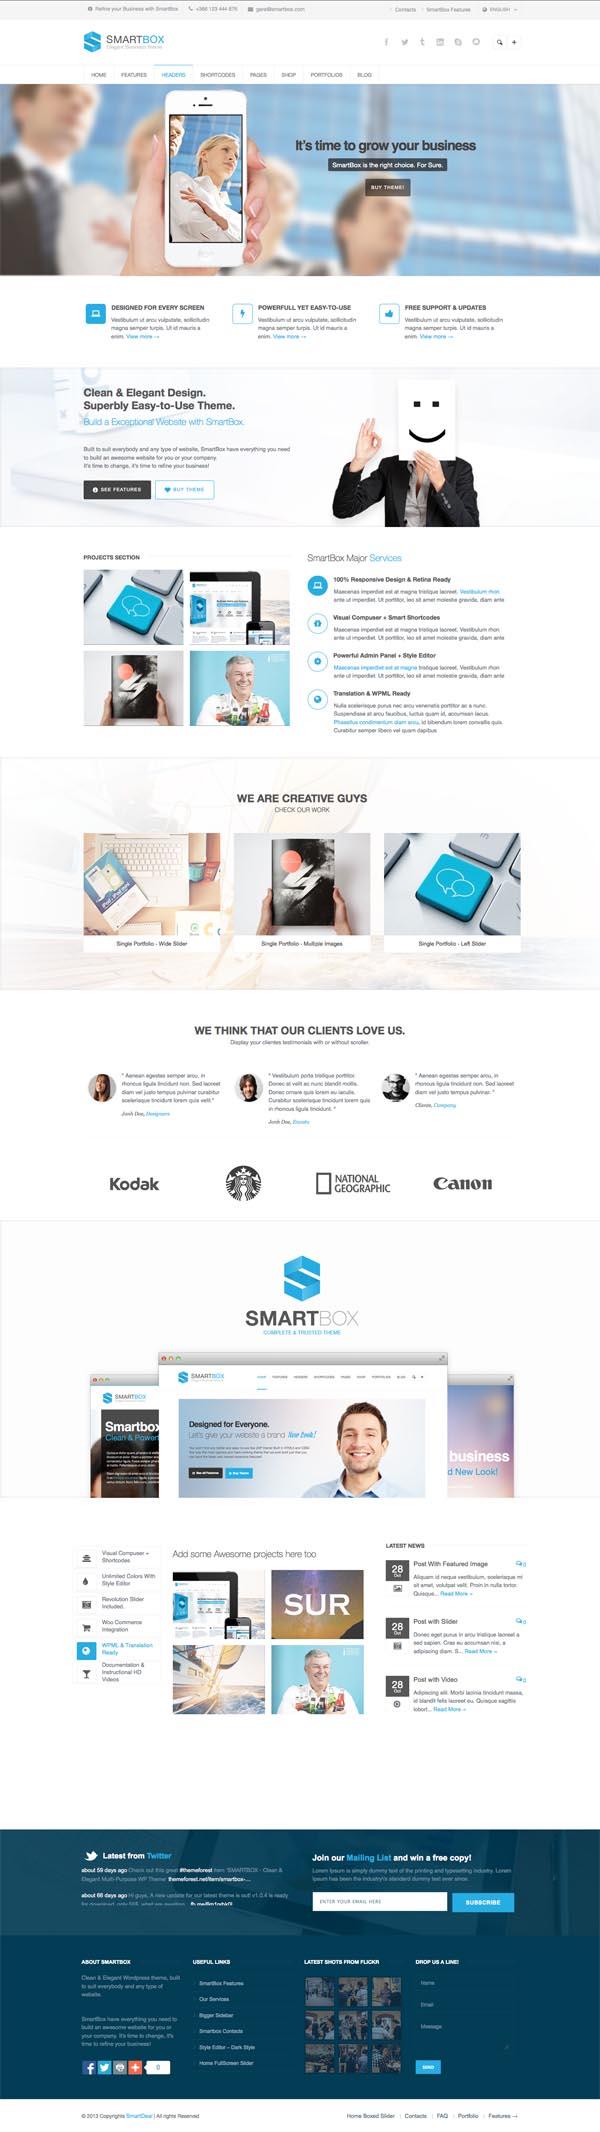 https://blog.karachicorner.com/wp-content/uploads/2014/03/SmartBox-PSD-Template-Medium.jpg